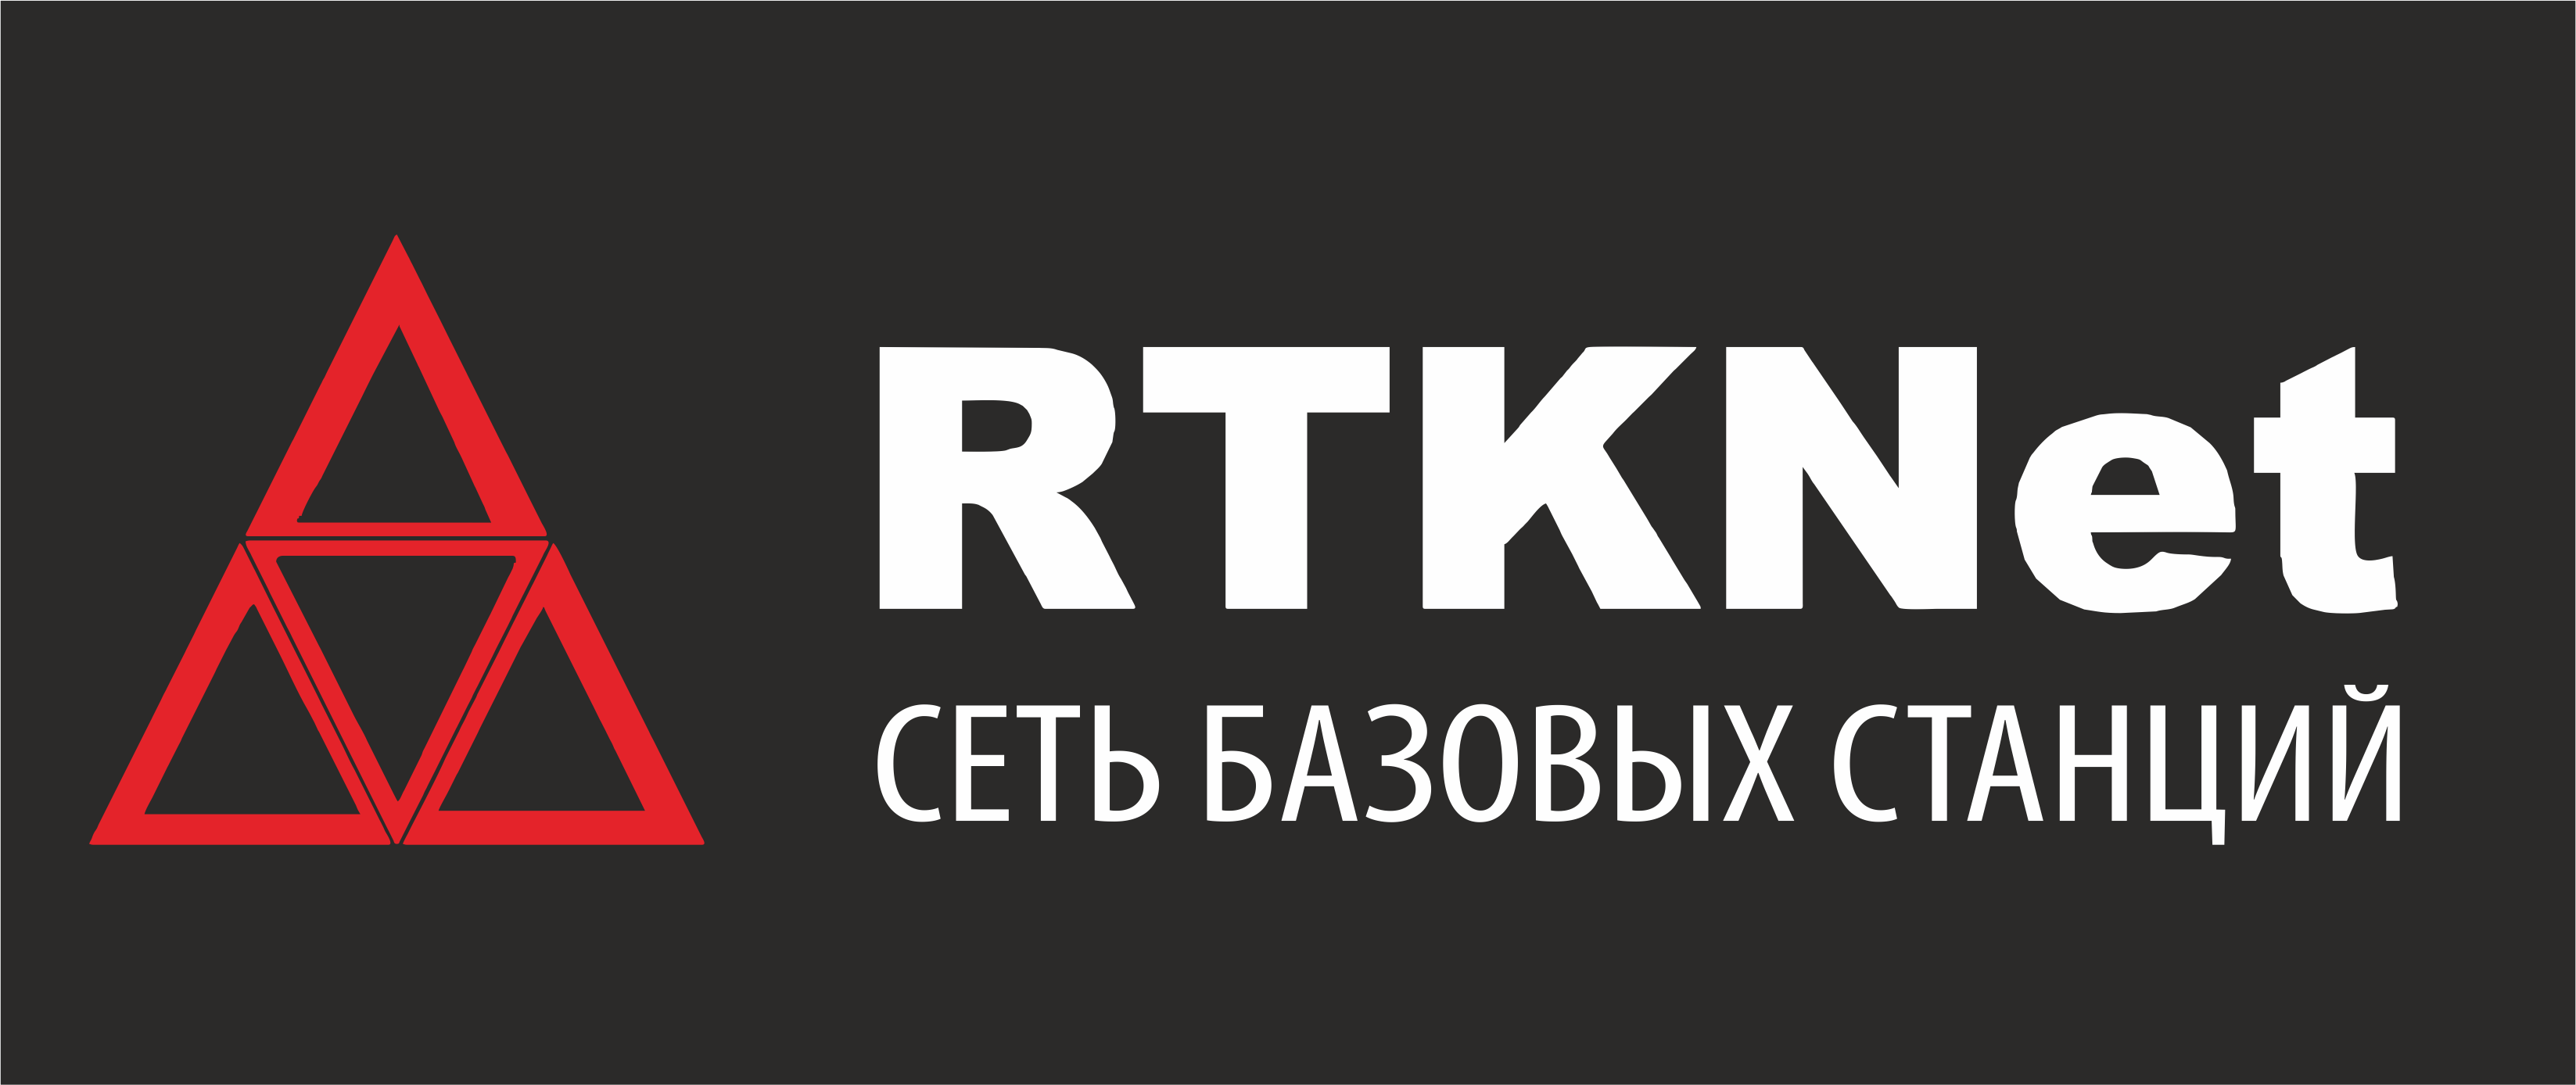 RTKNet